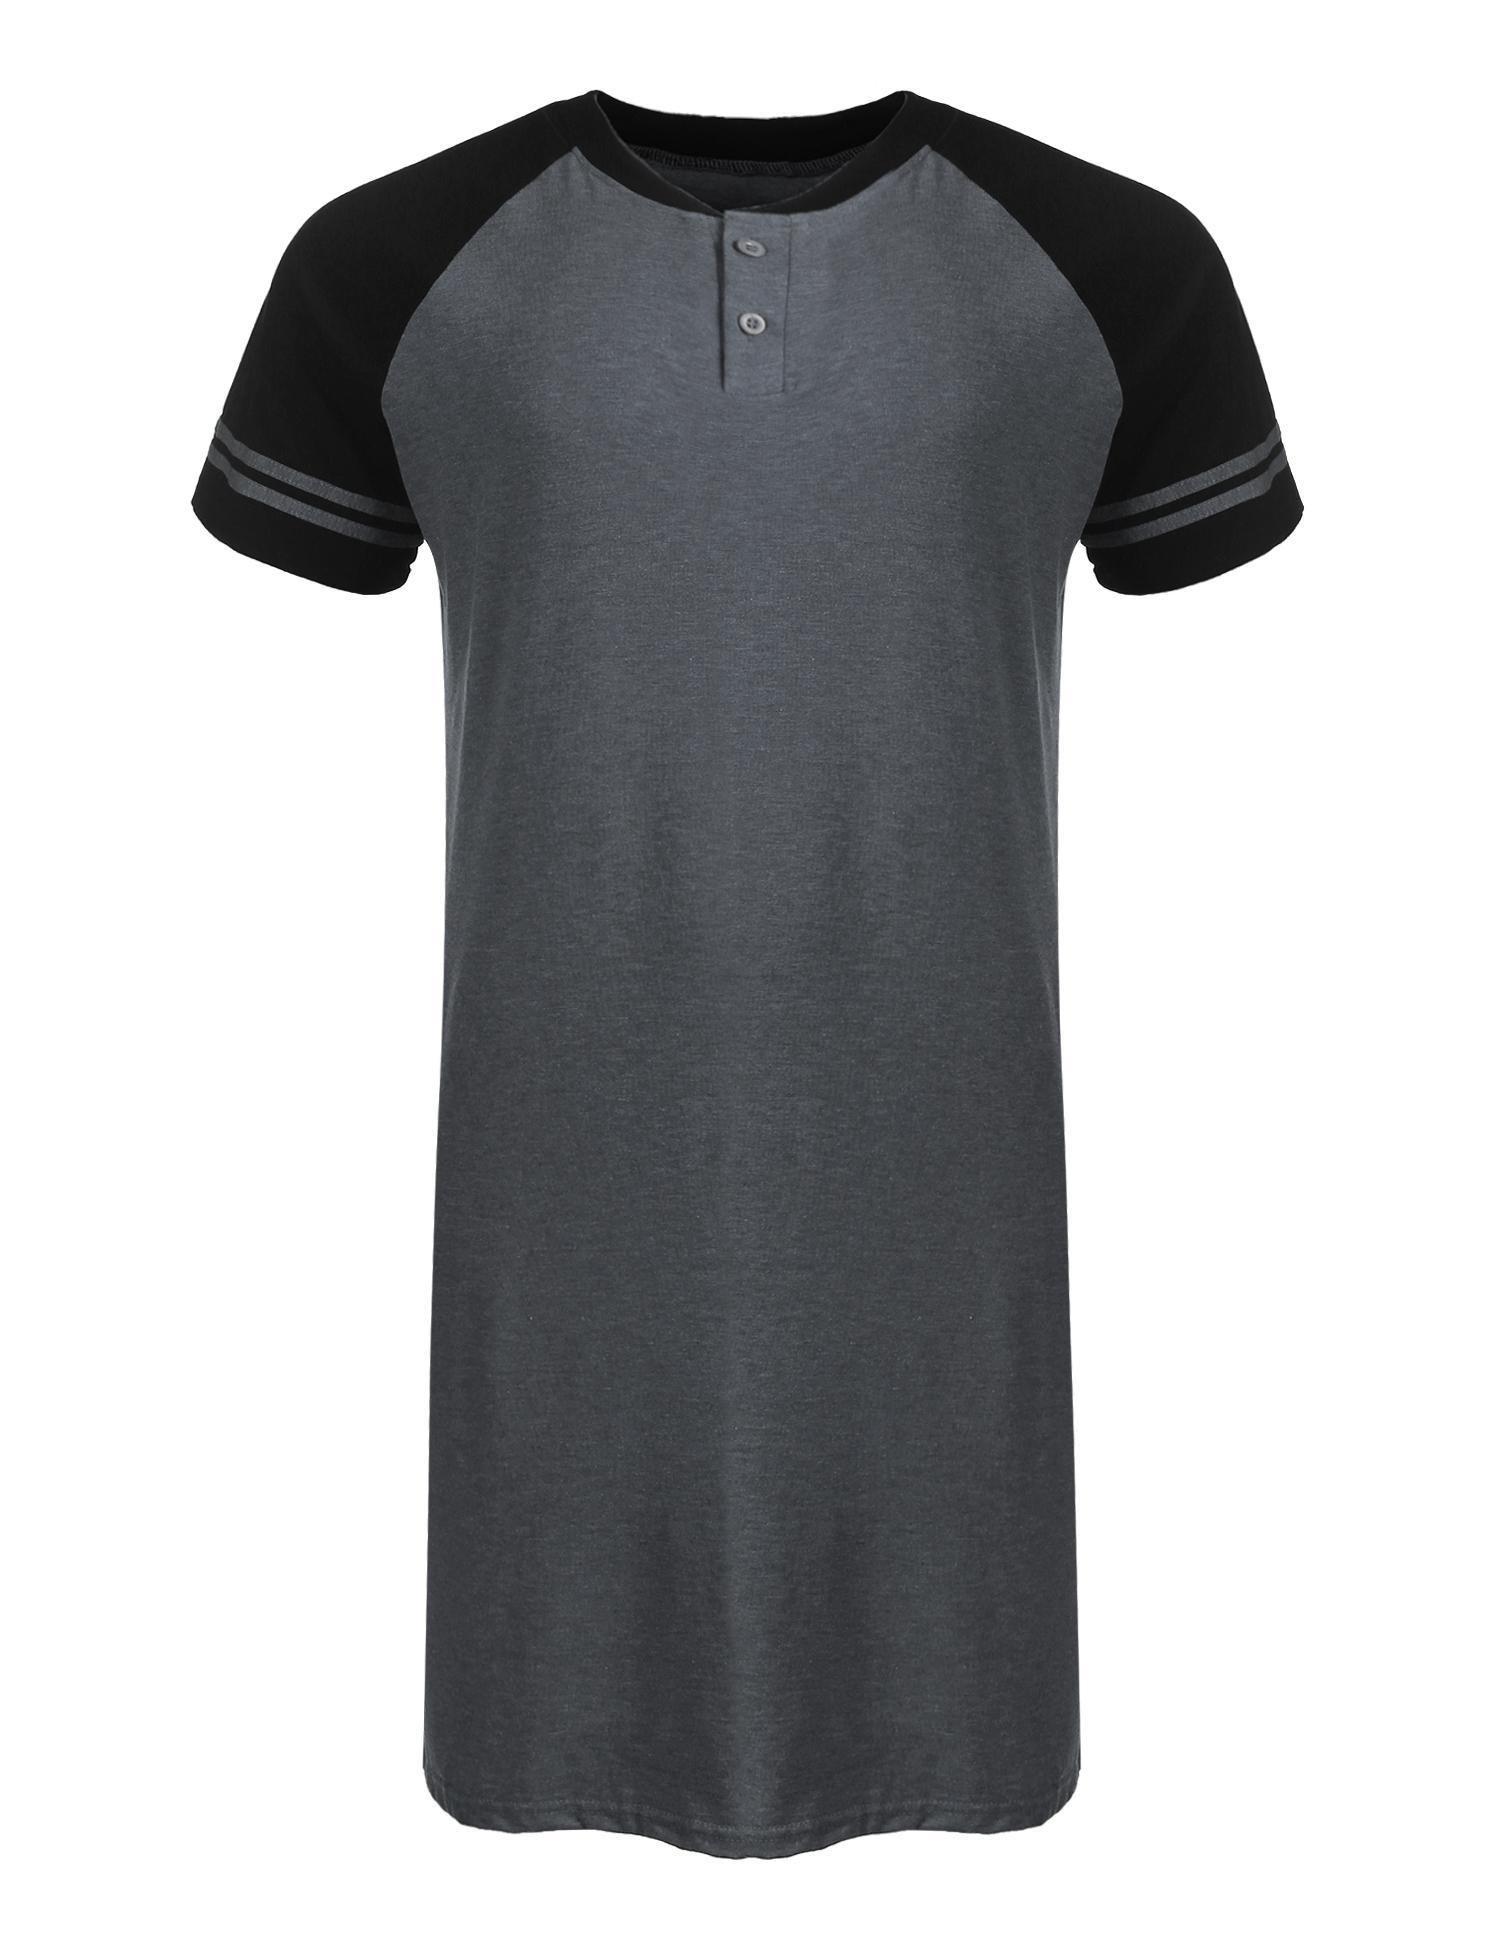 Dicesnow Men's Cotton Knit Nightshirt Sleep Shirt Comfort Sleepwear